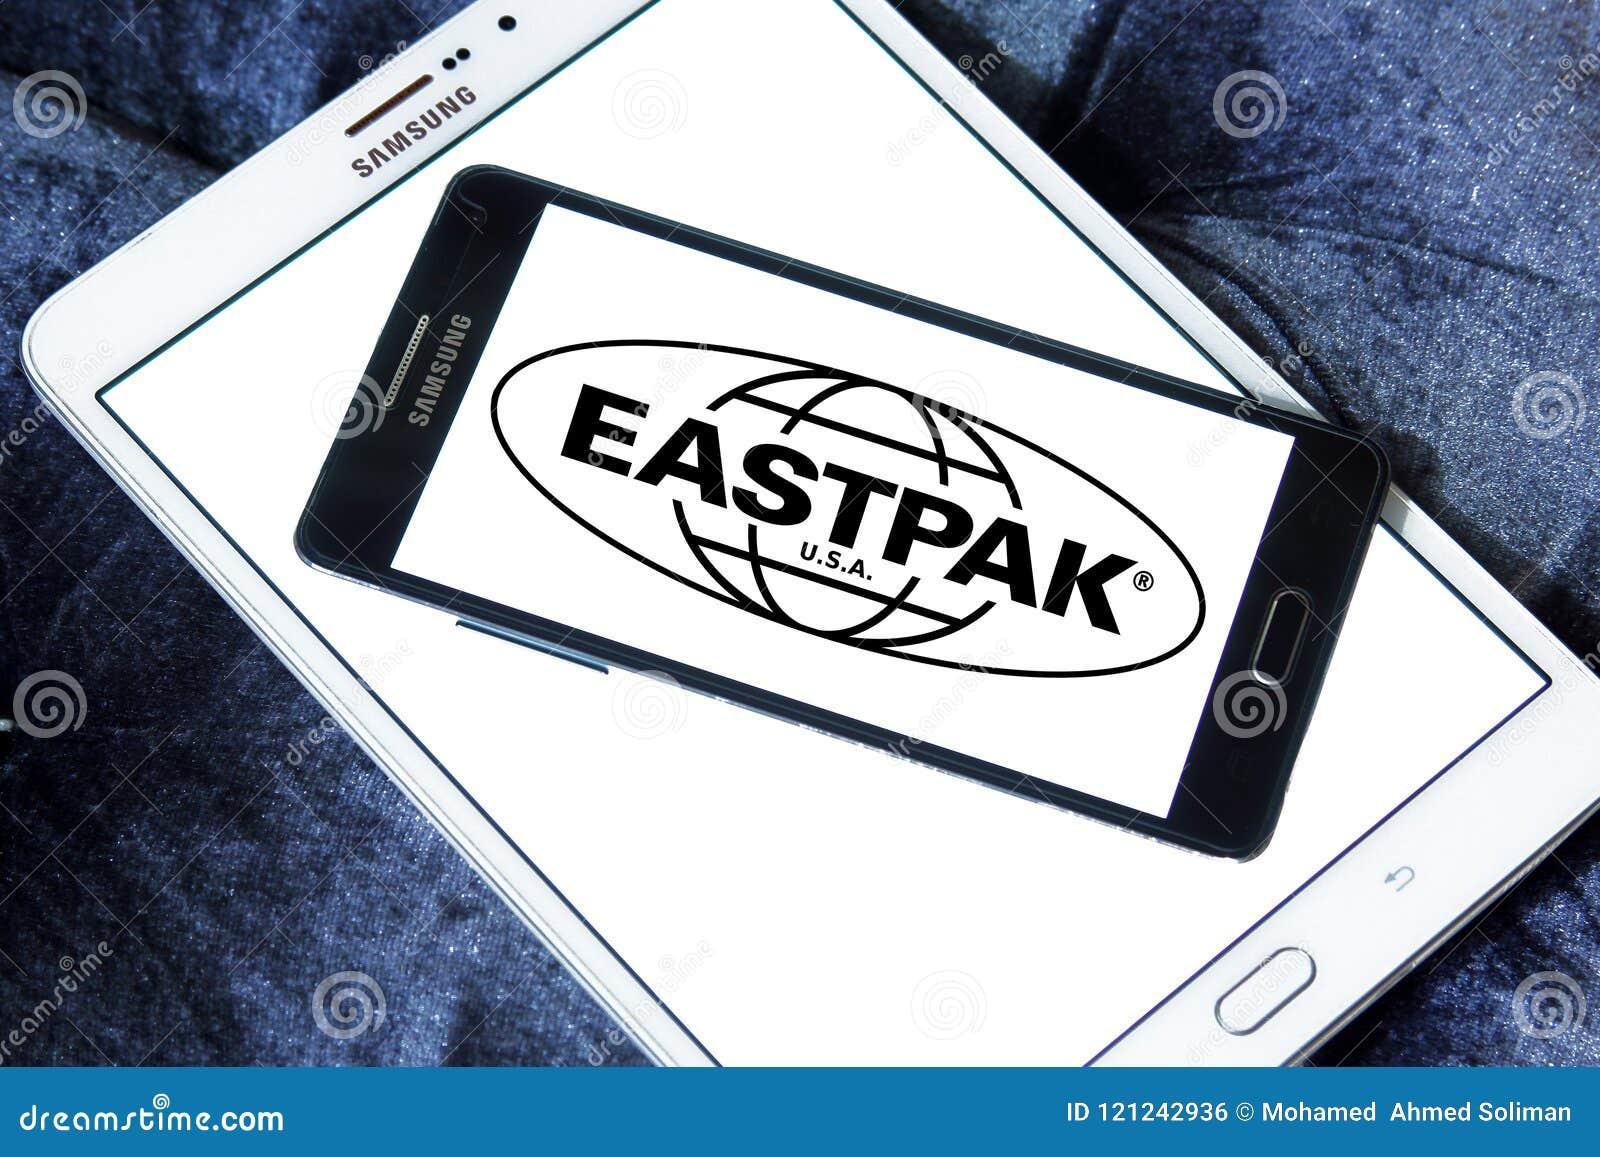 Eastpak company logo editorial photo  Image of brands - 121242936